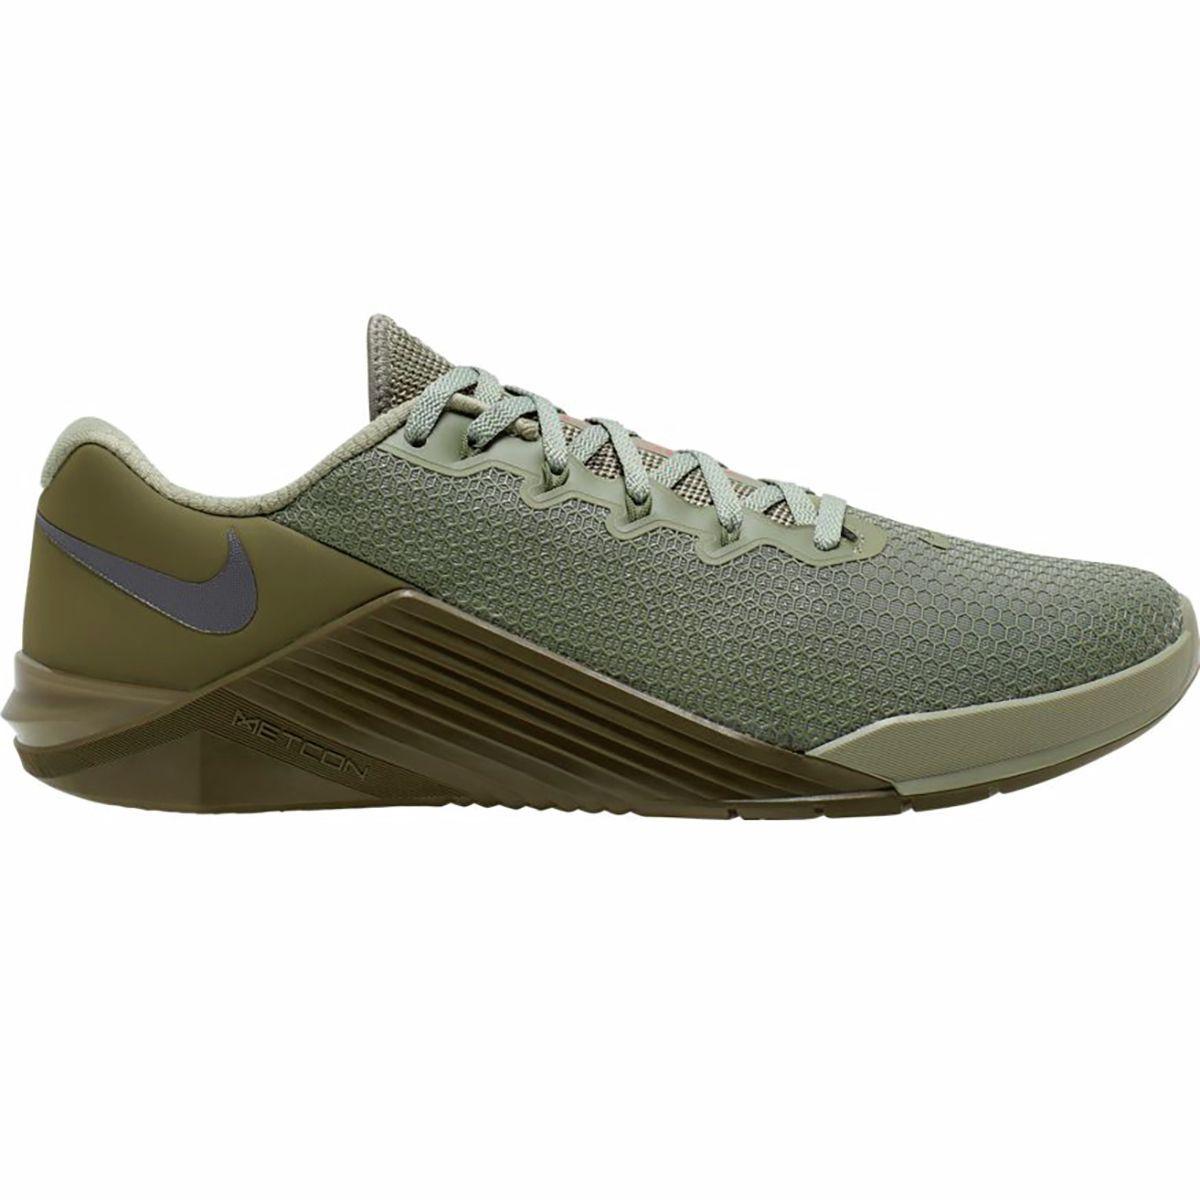 Nike Metcon 5 Training Shoe - Men's